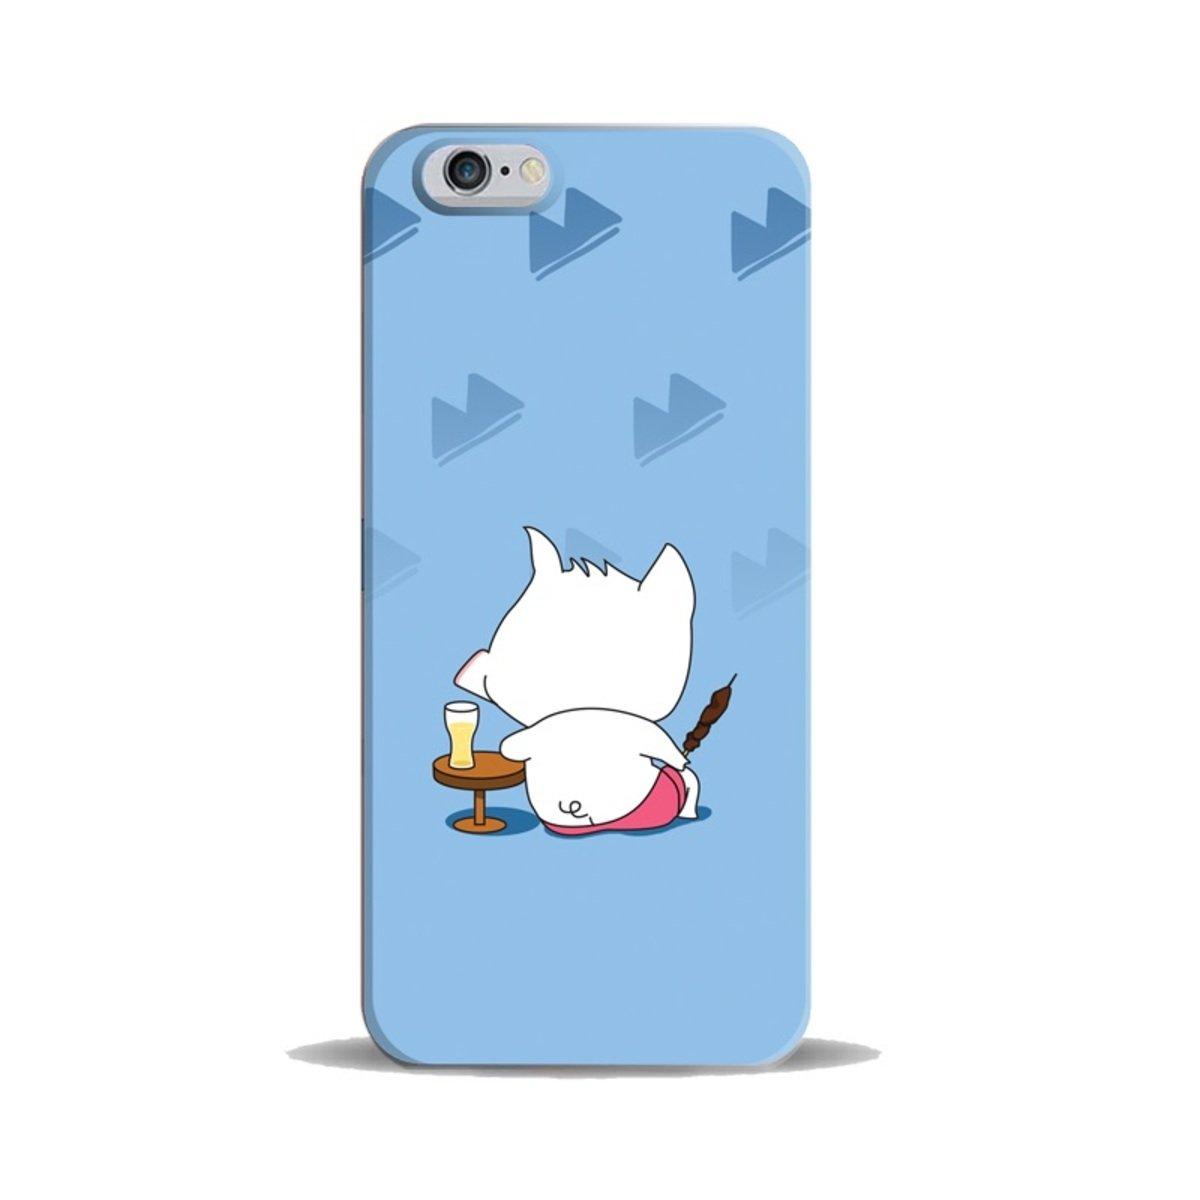 "iPhase - iPhone 6 (4.7"") 手機膠殼電話保護套 4.7寸 (White Piggy) (另有適合iPhone 6 Plus 5.5寸型號)"